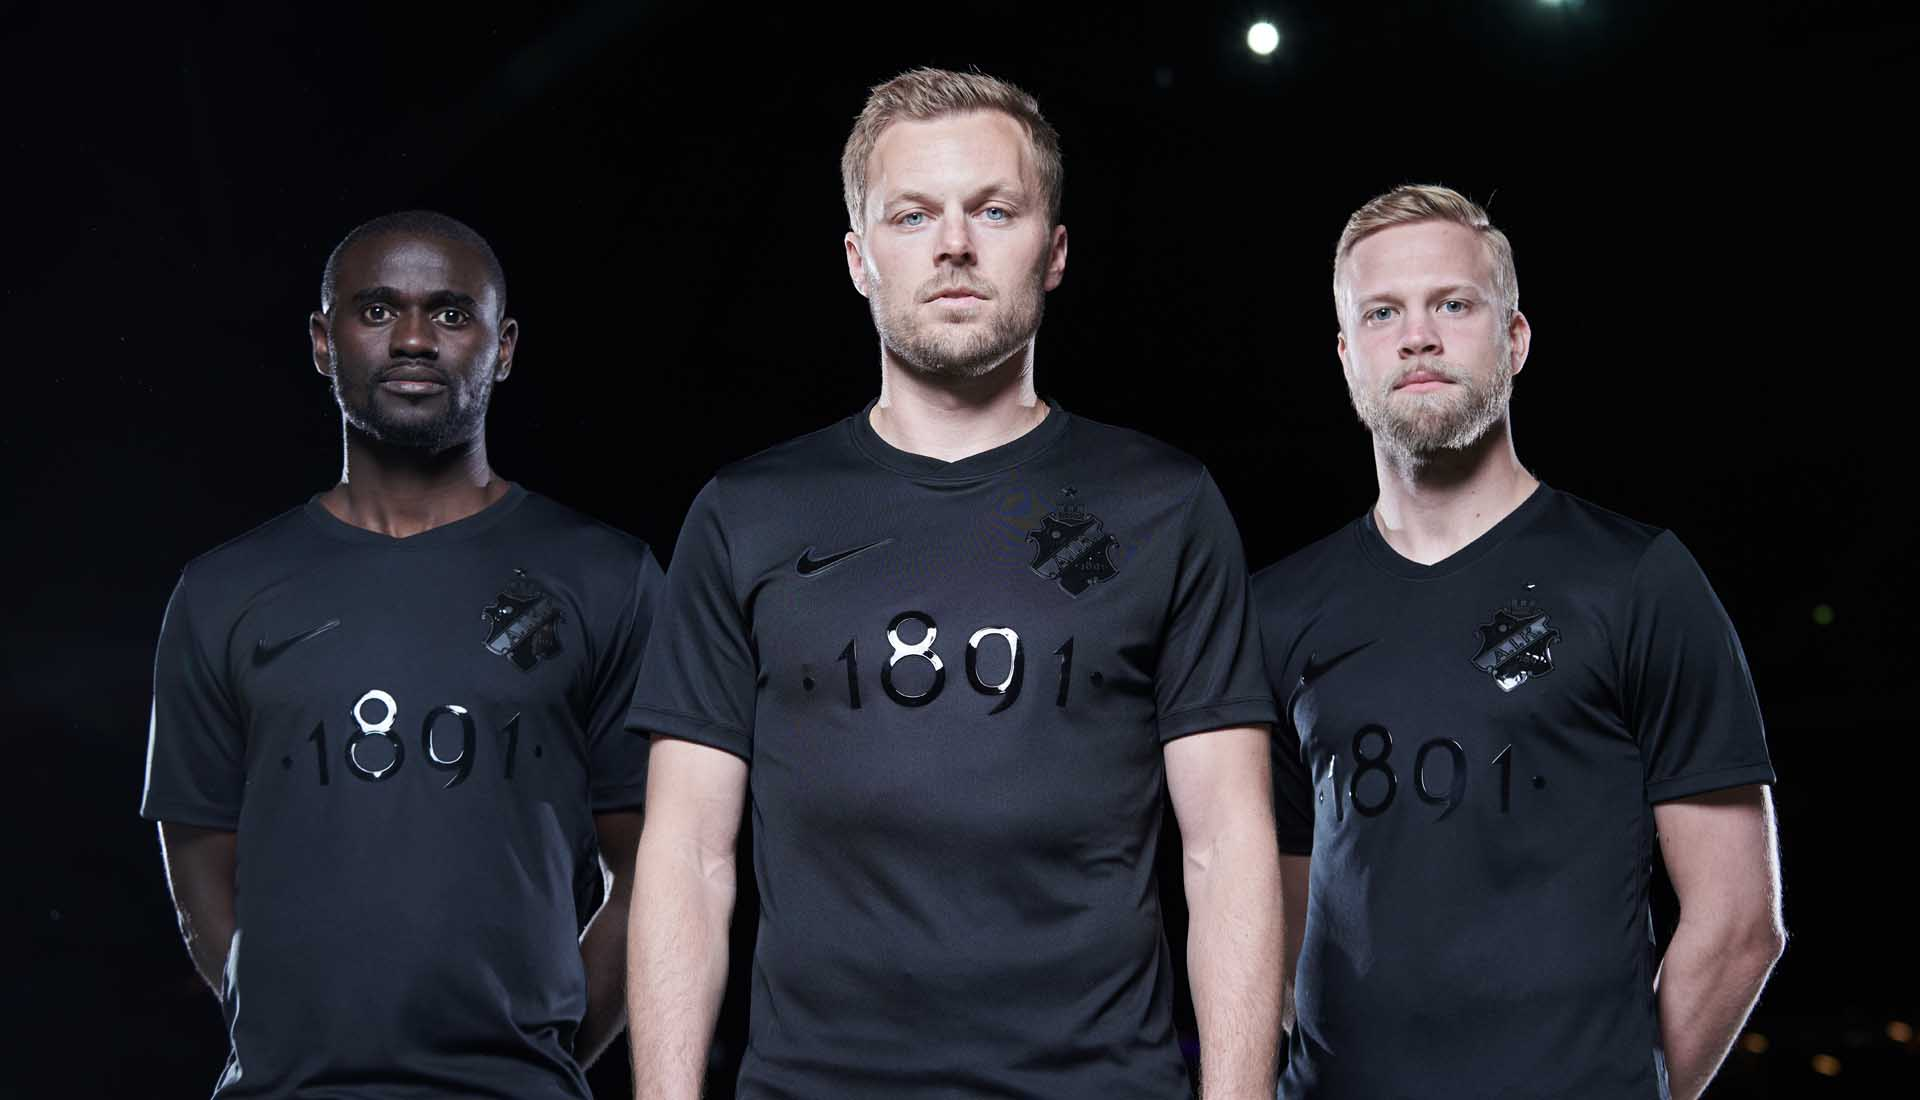 eea828c53f3 Nike Launch Stunning AIK 1891 Black Edition Jersey - SoccerBible